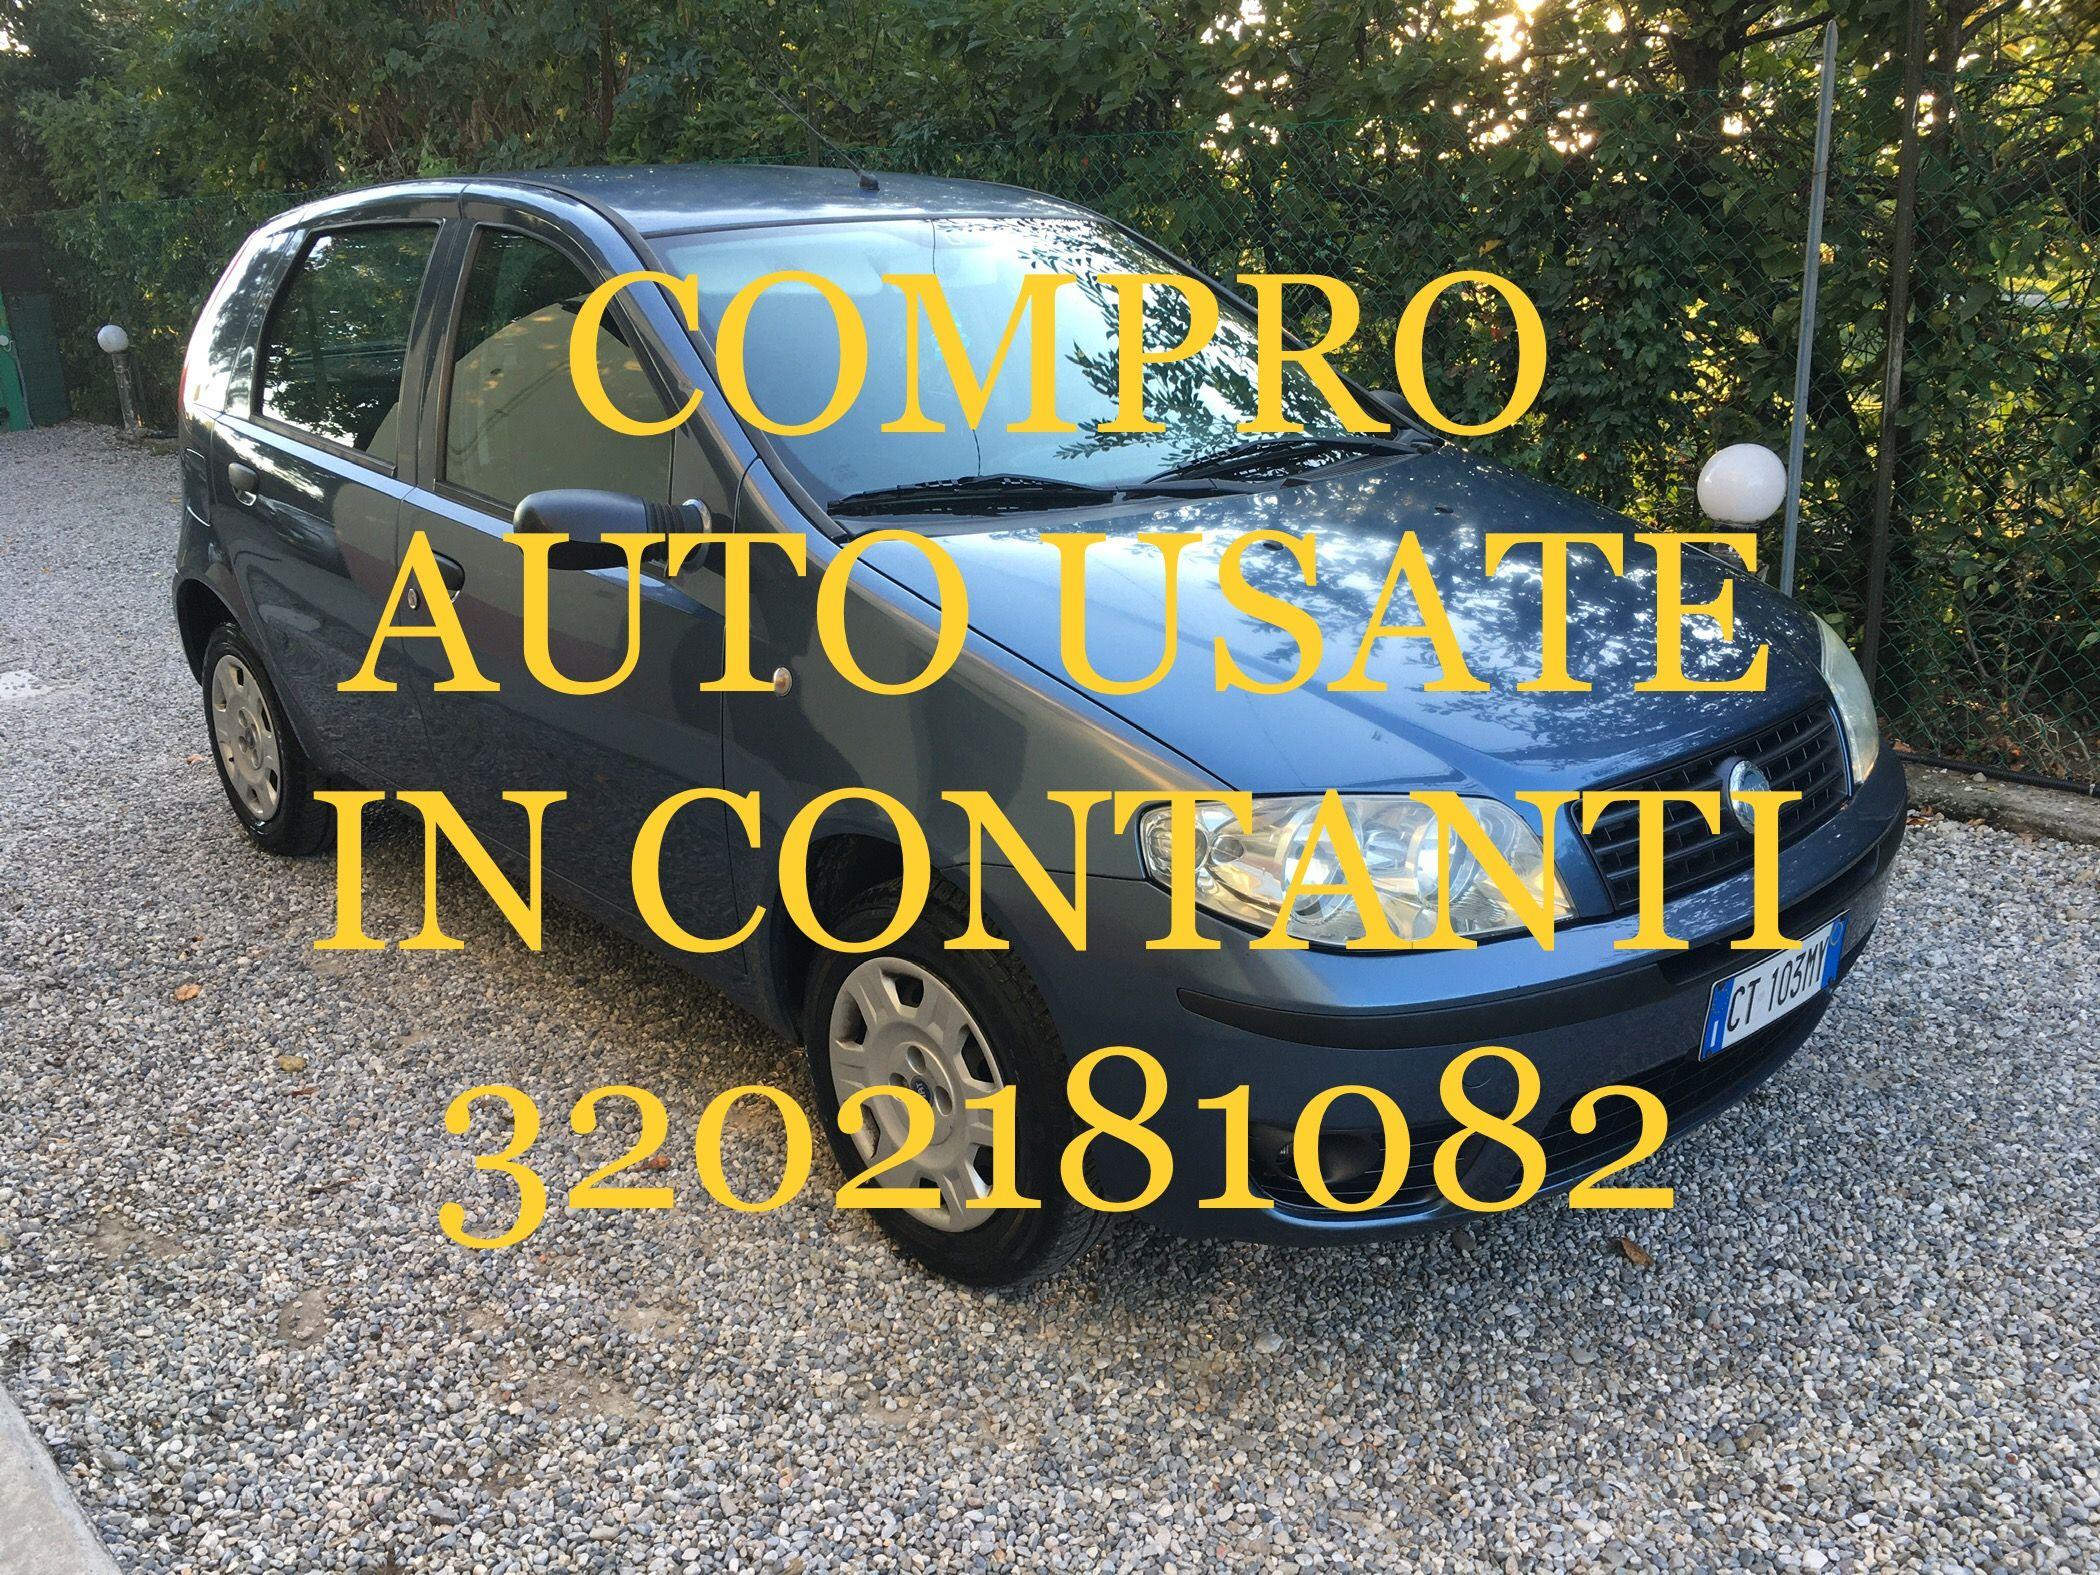 Acquistiamo auto usate Bologna 3202181082